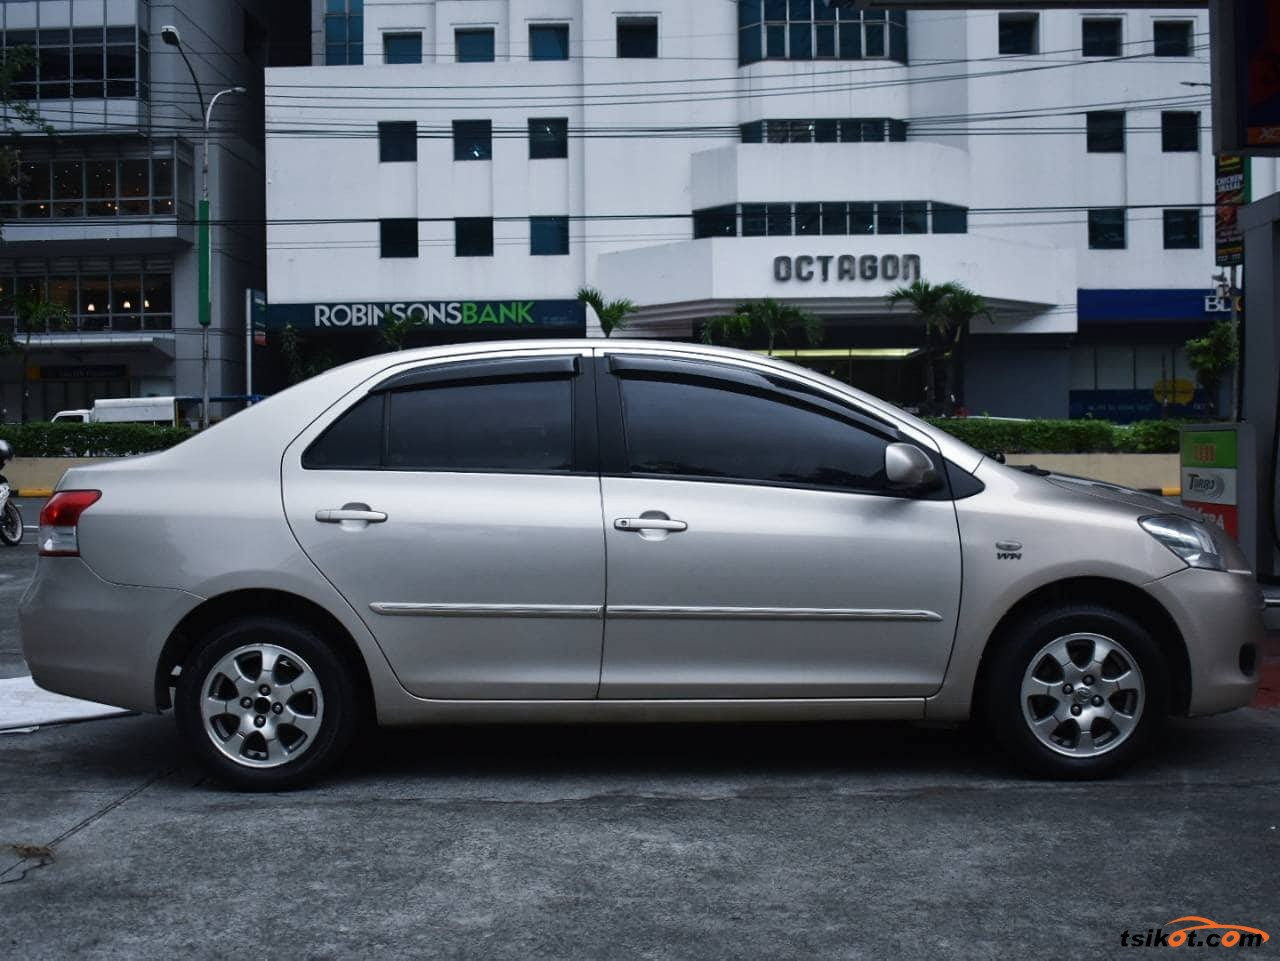 Kelebihan Kekurangan Toyota Vios 2007 Top Model Tahun Ini